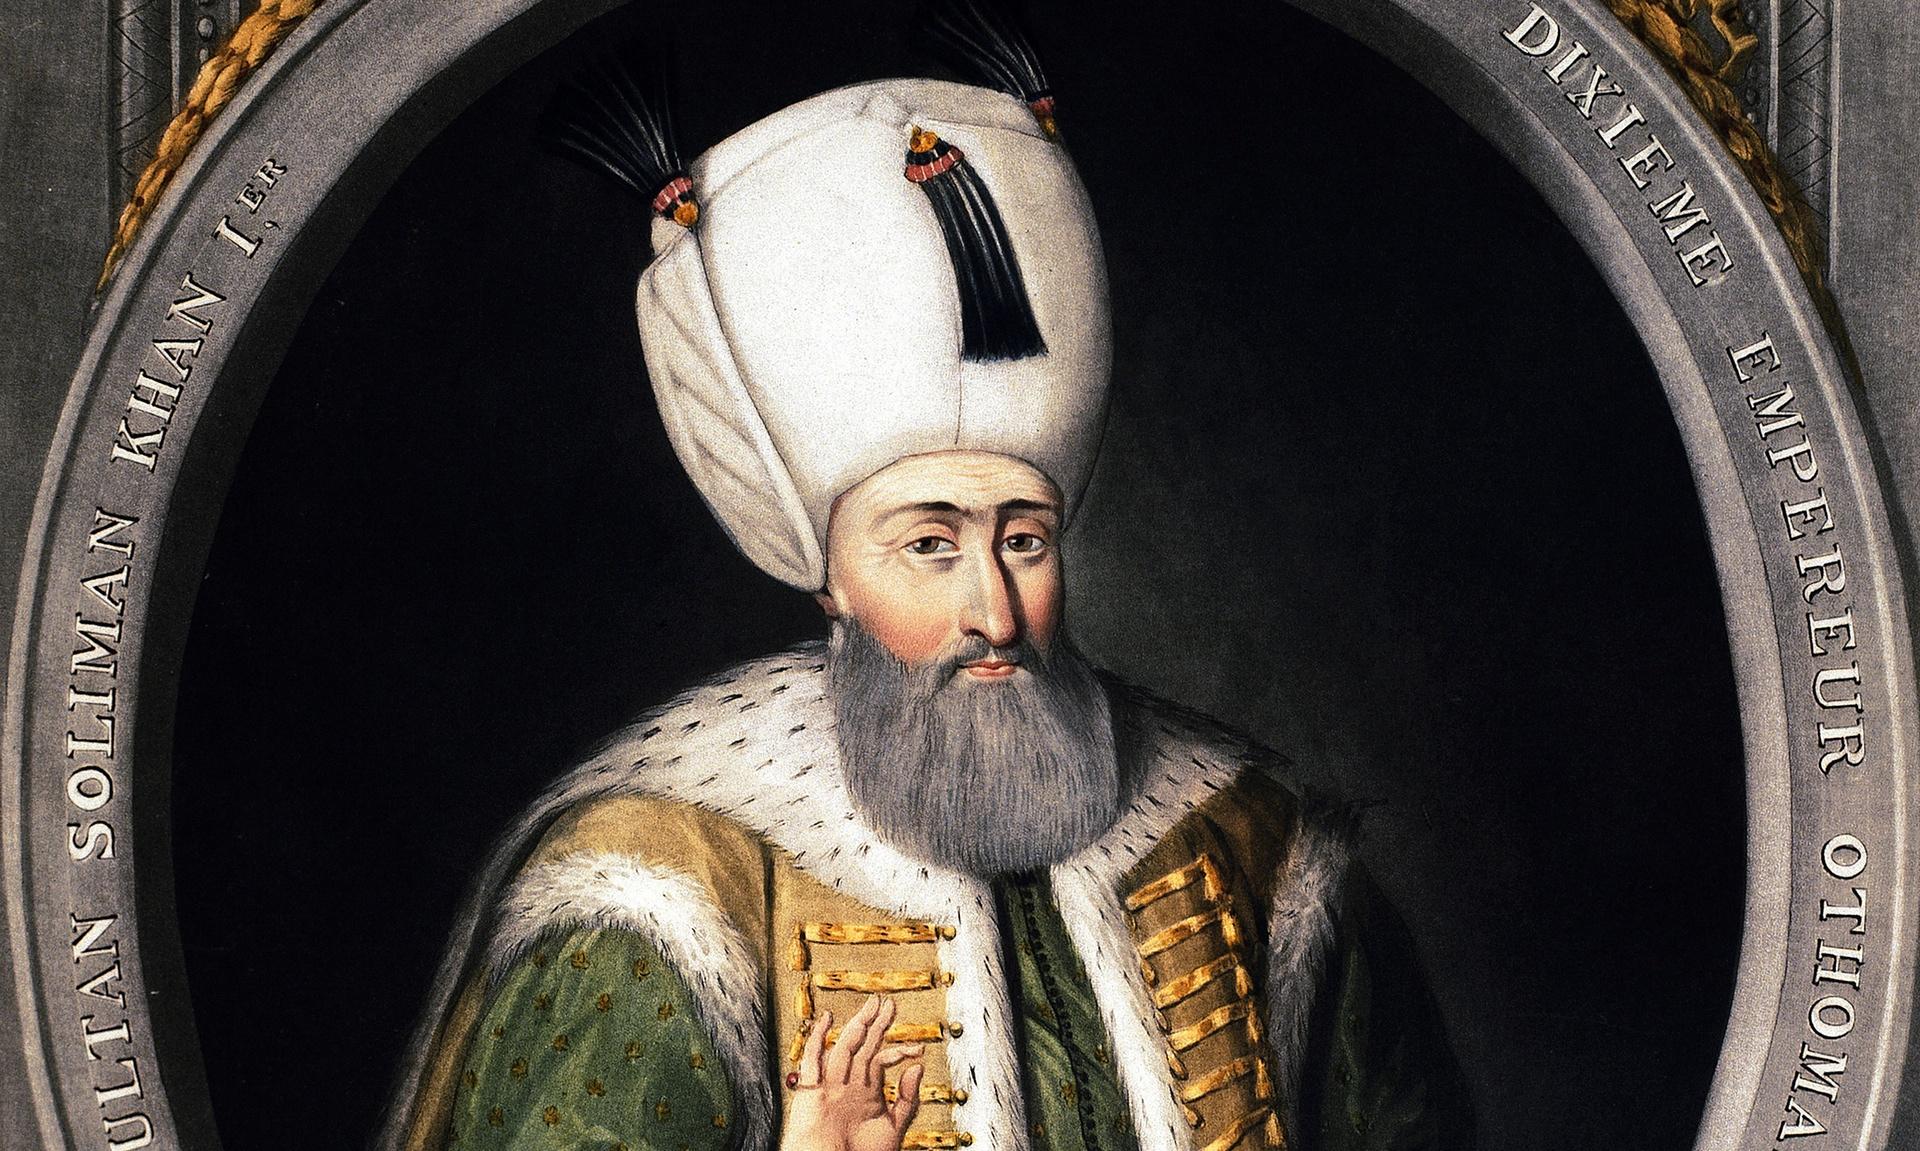 На юге Венгрии найдена могила султана Османской империи Сулеймана